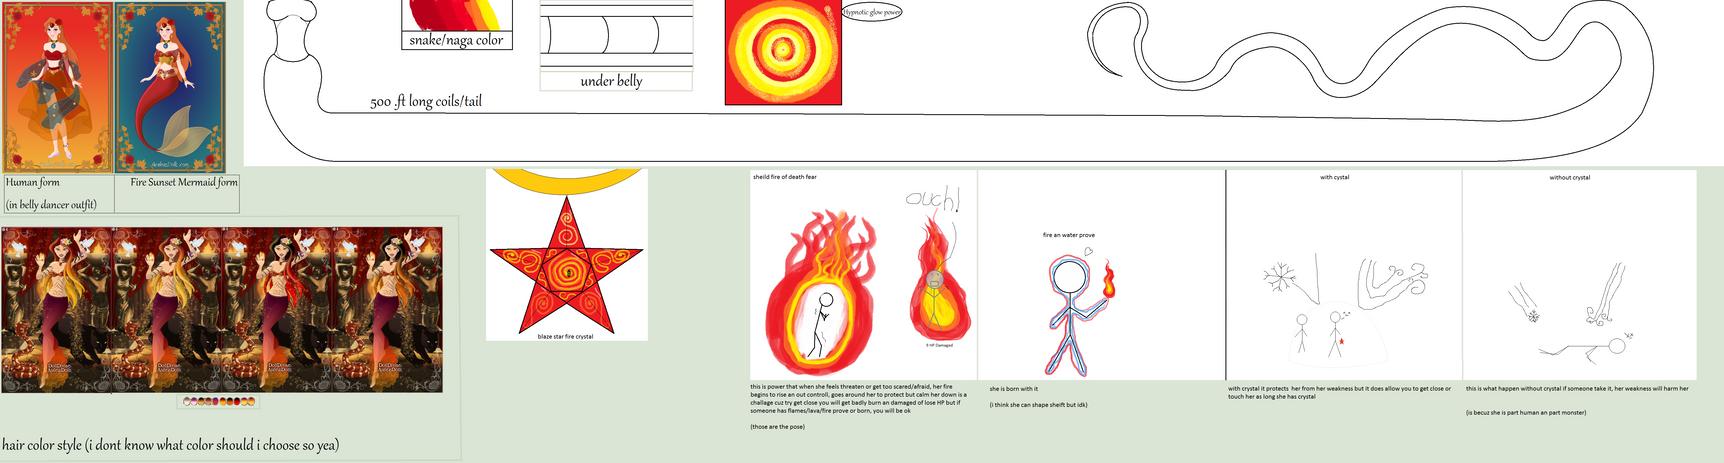 Calida Blaze Amber The Fire Girl by starryfan